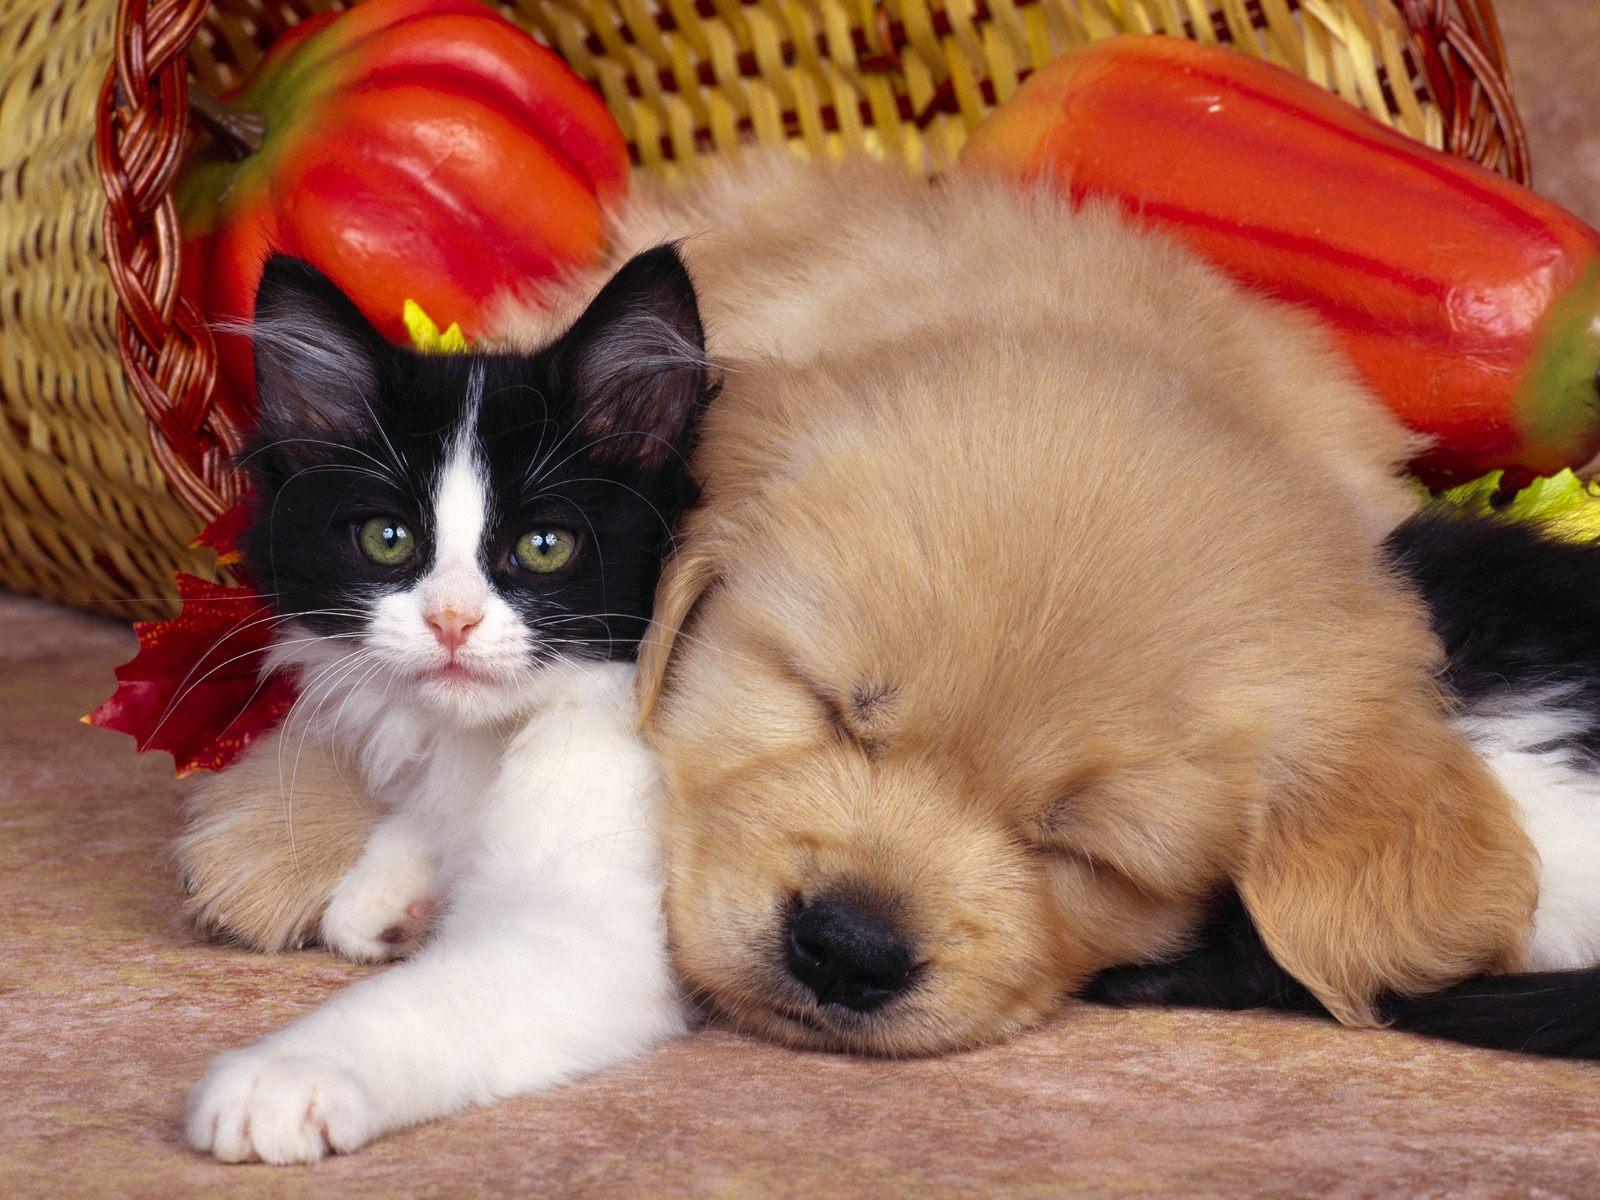 http://2.bp.blogspot.com/-PrDOnRXbGxk/TbHkkDw6gdI/AAAAAAAAAvE/wdoJG6n6CsY/s1600/Cat-Dog%2B.jpg